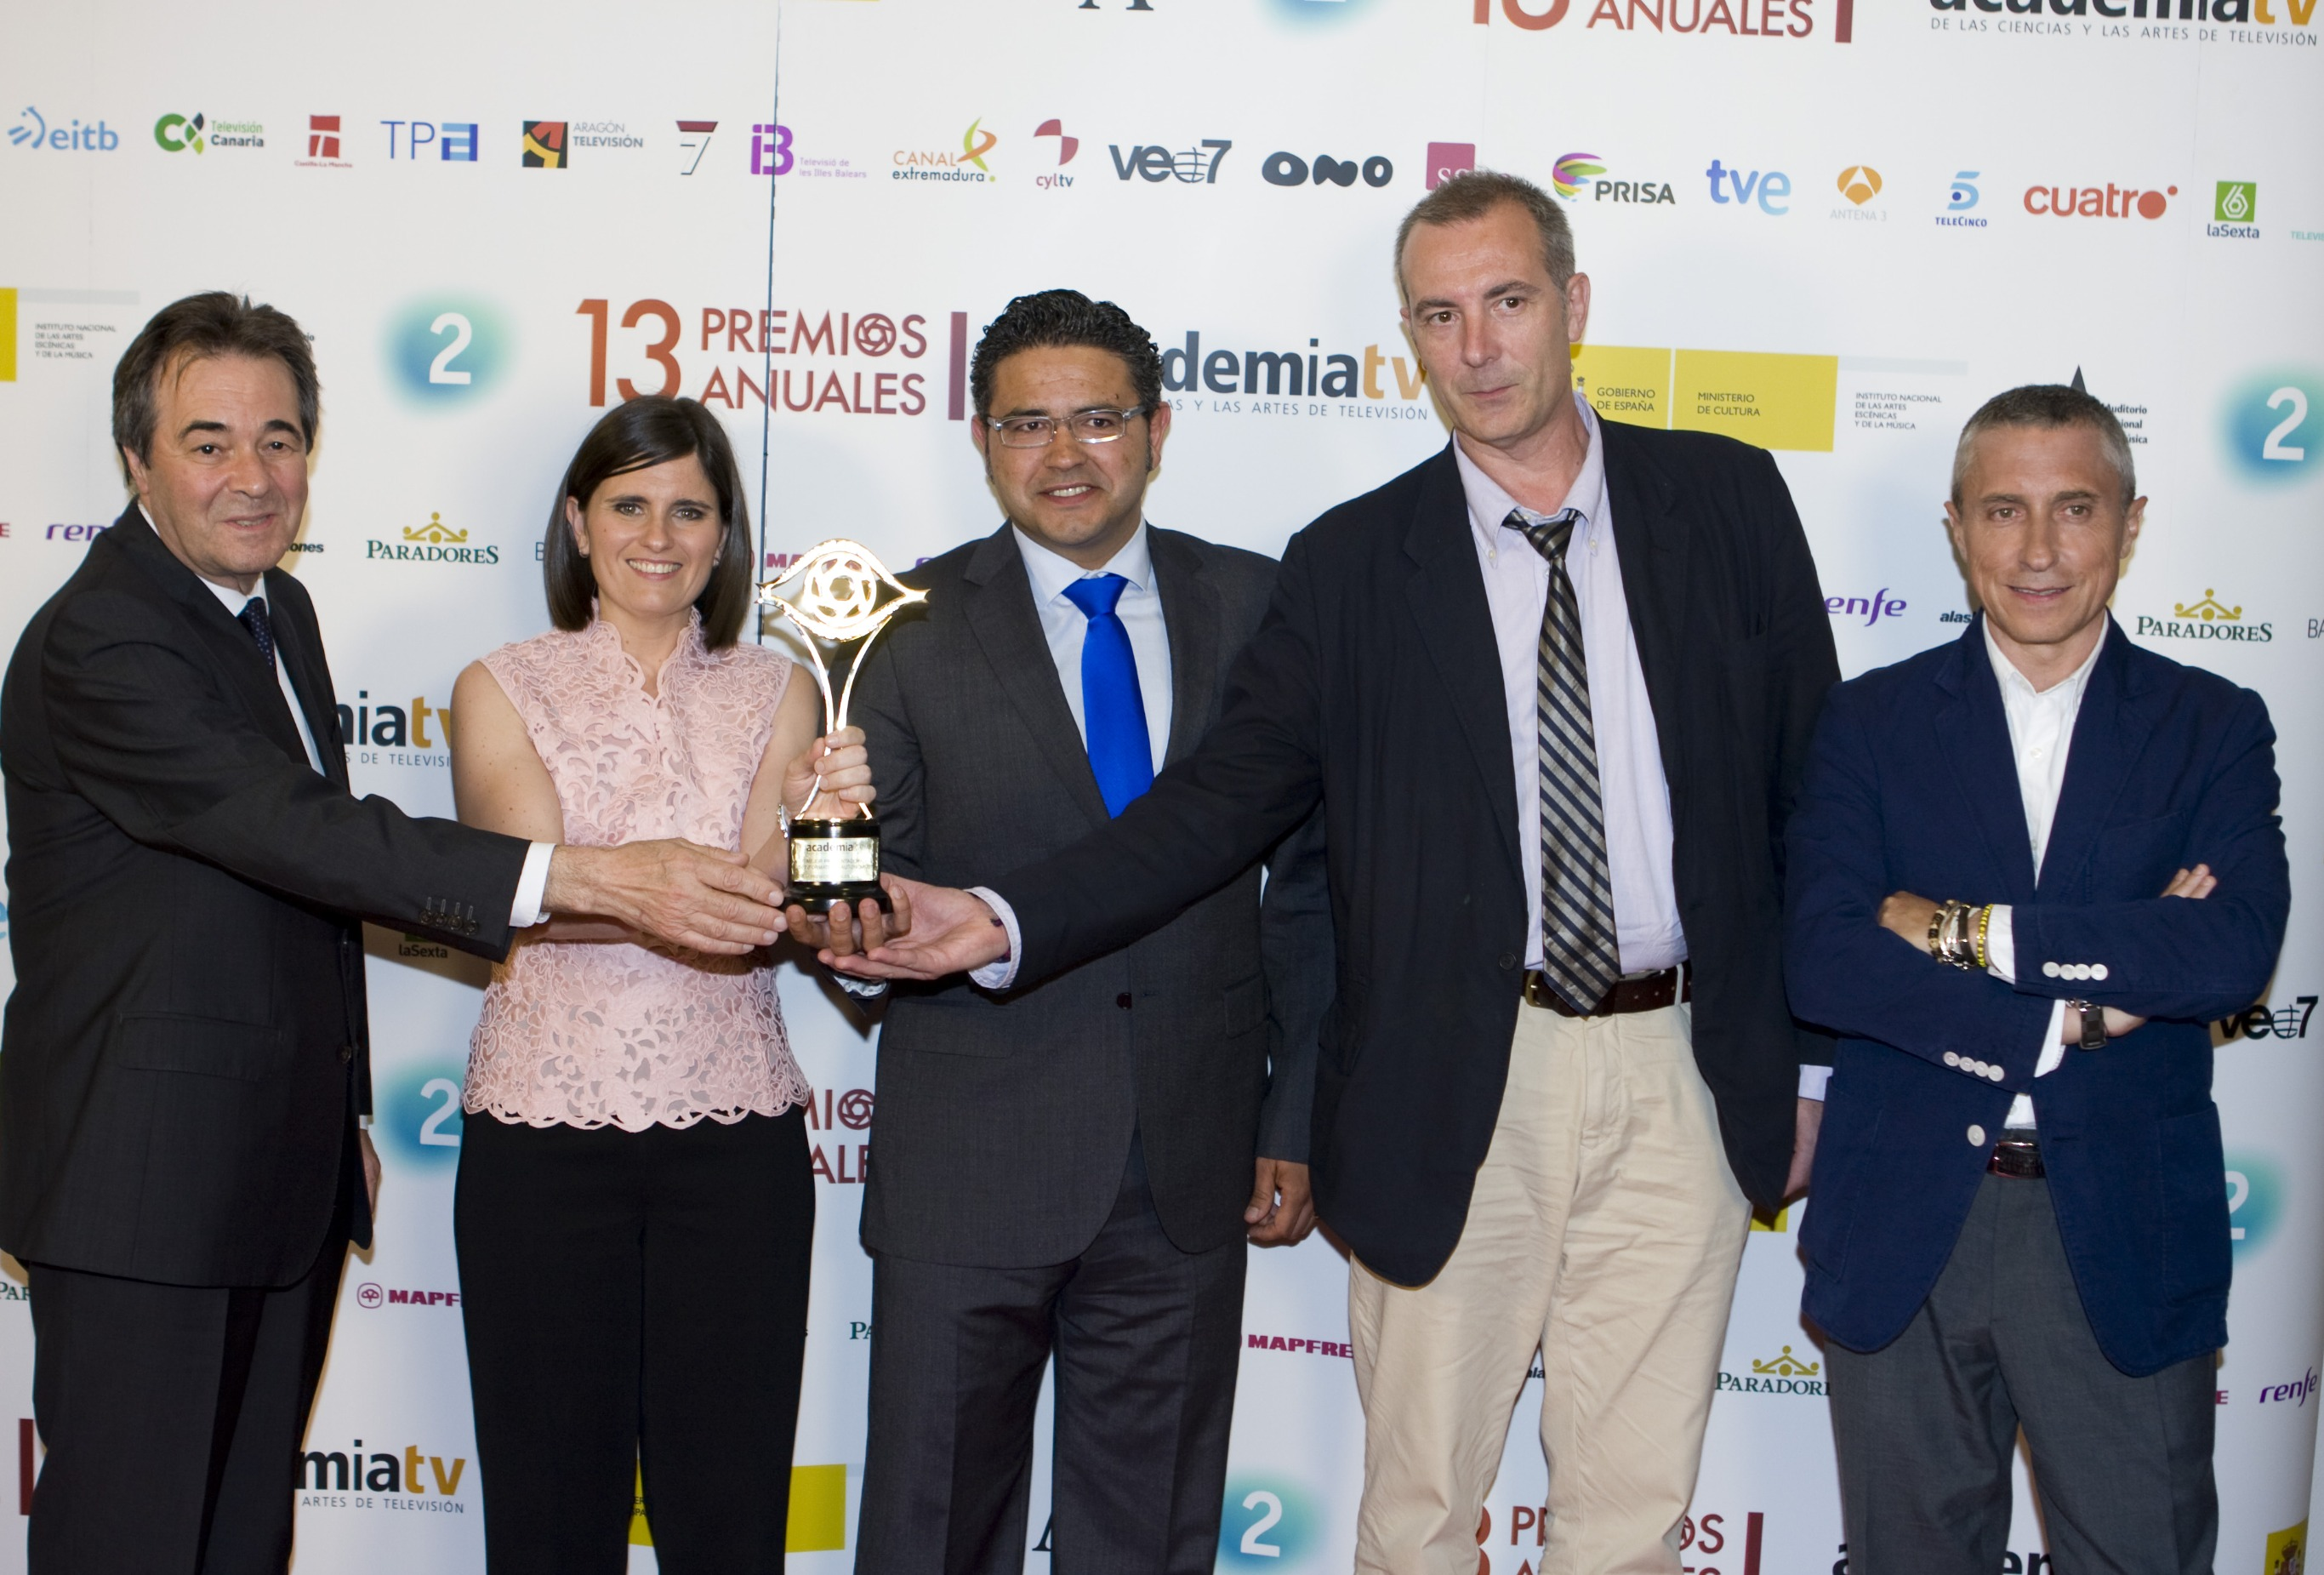 José Ramón Pérez Ornia, Bárbara Alonso, Ignacio Menéndez del Campo, Juan José Guerenabarrena y Melchor Miralles